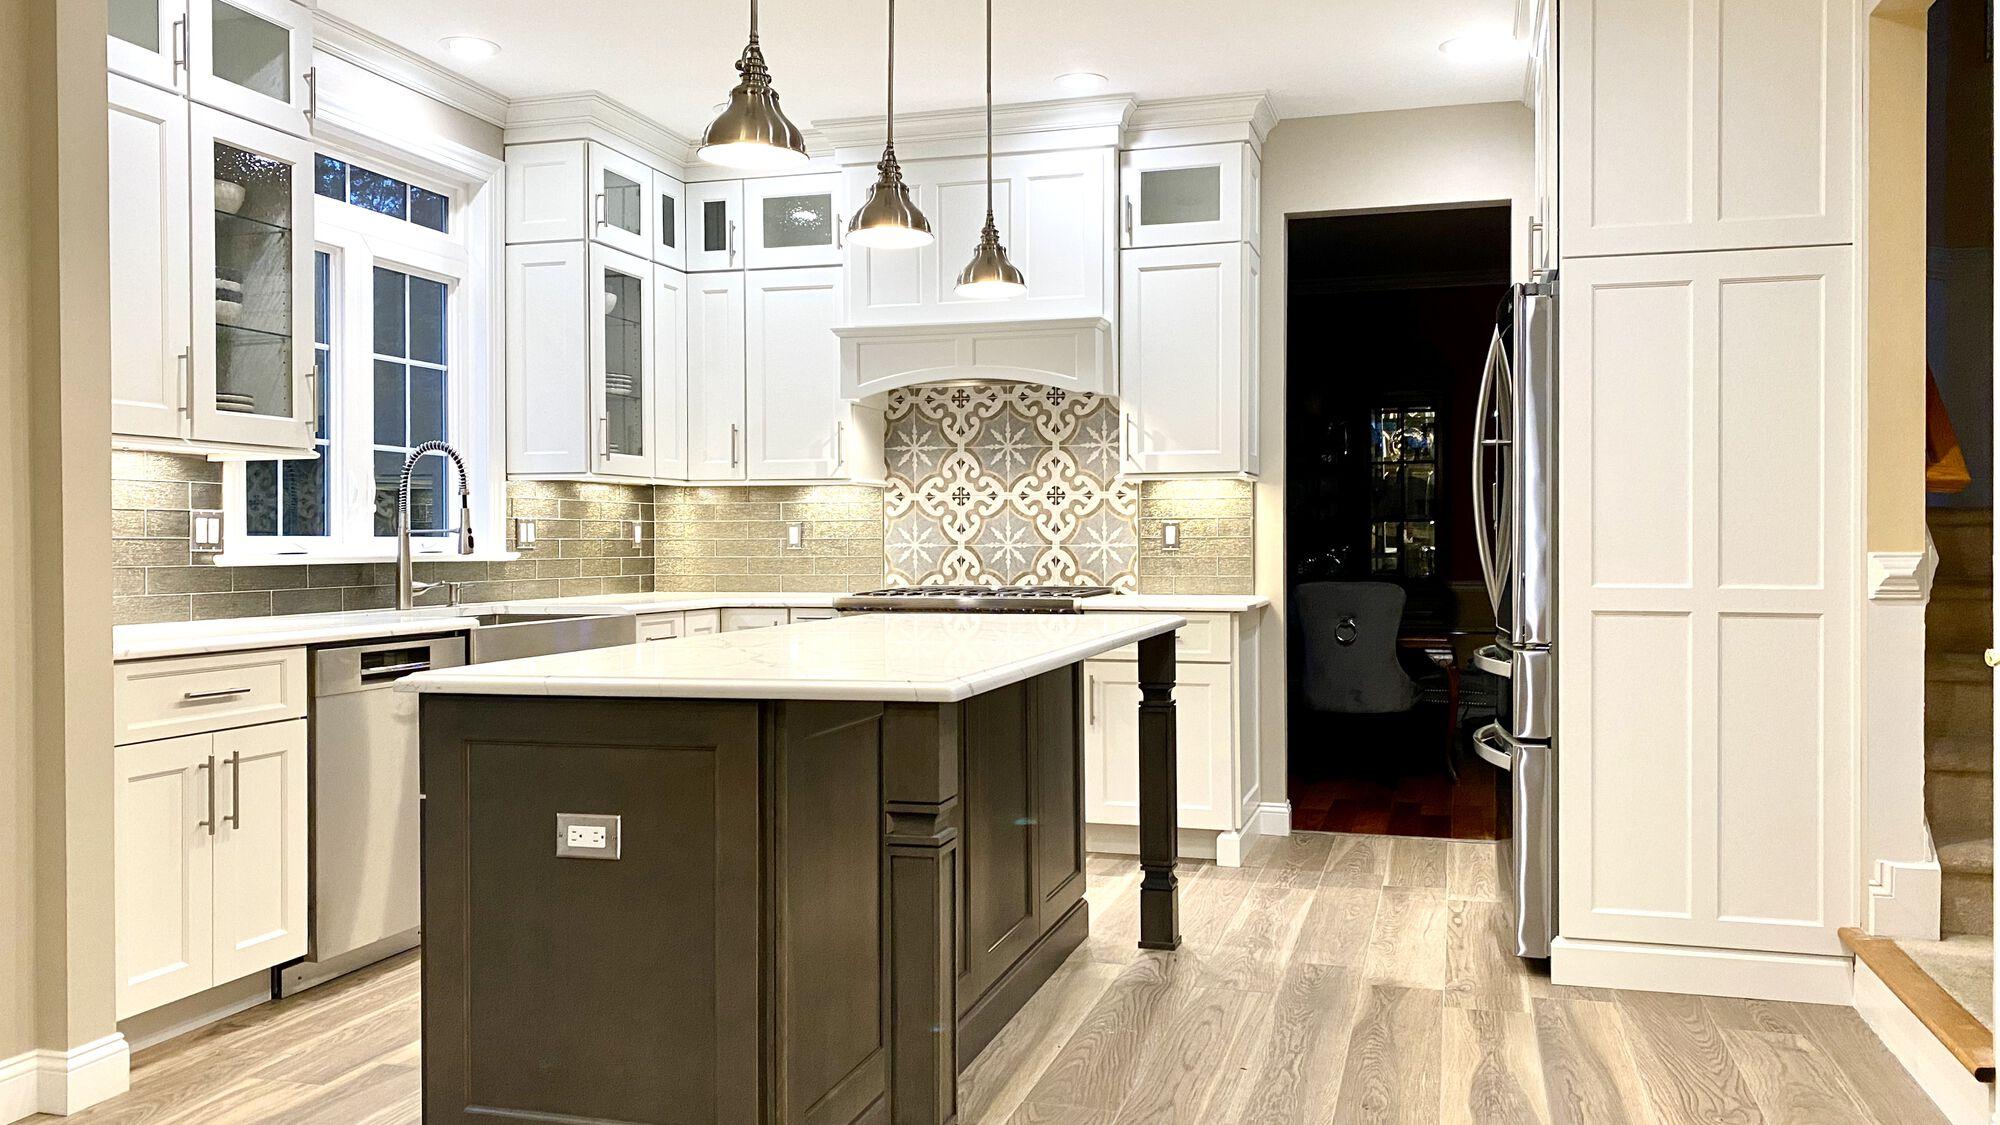 Custom Kitchen Reno with Brighton Cabinetry, Quartz Tops, Glass Tile Backsplash, Porcelain Tile Floor, LED Under-Cabinet Lighting In Central NJ